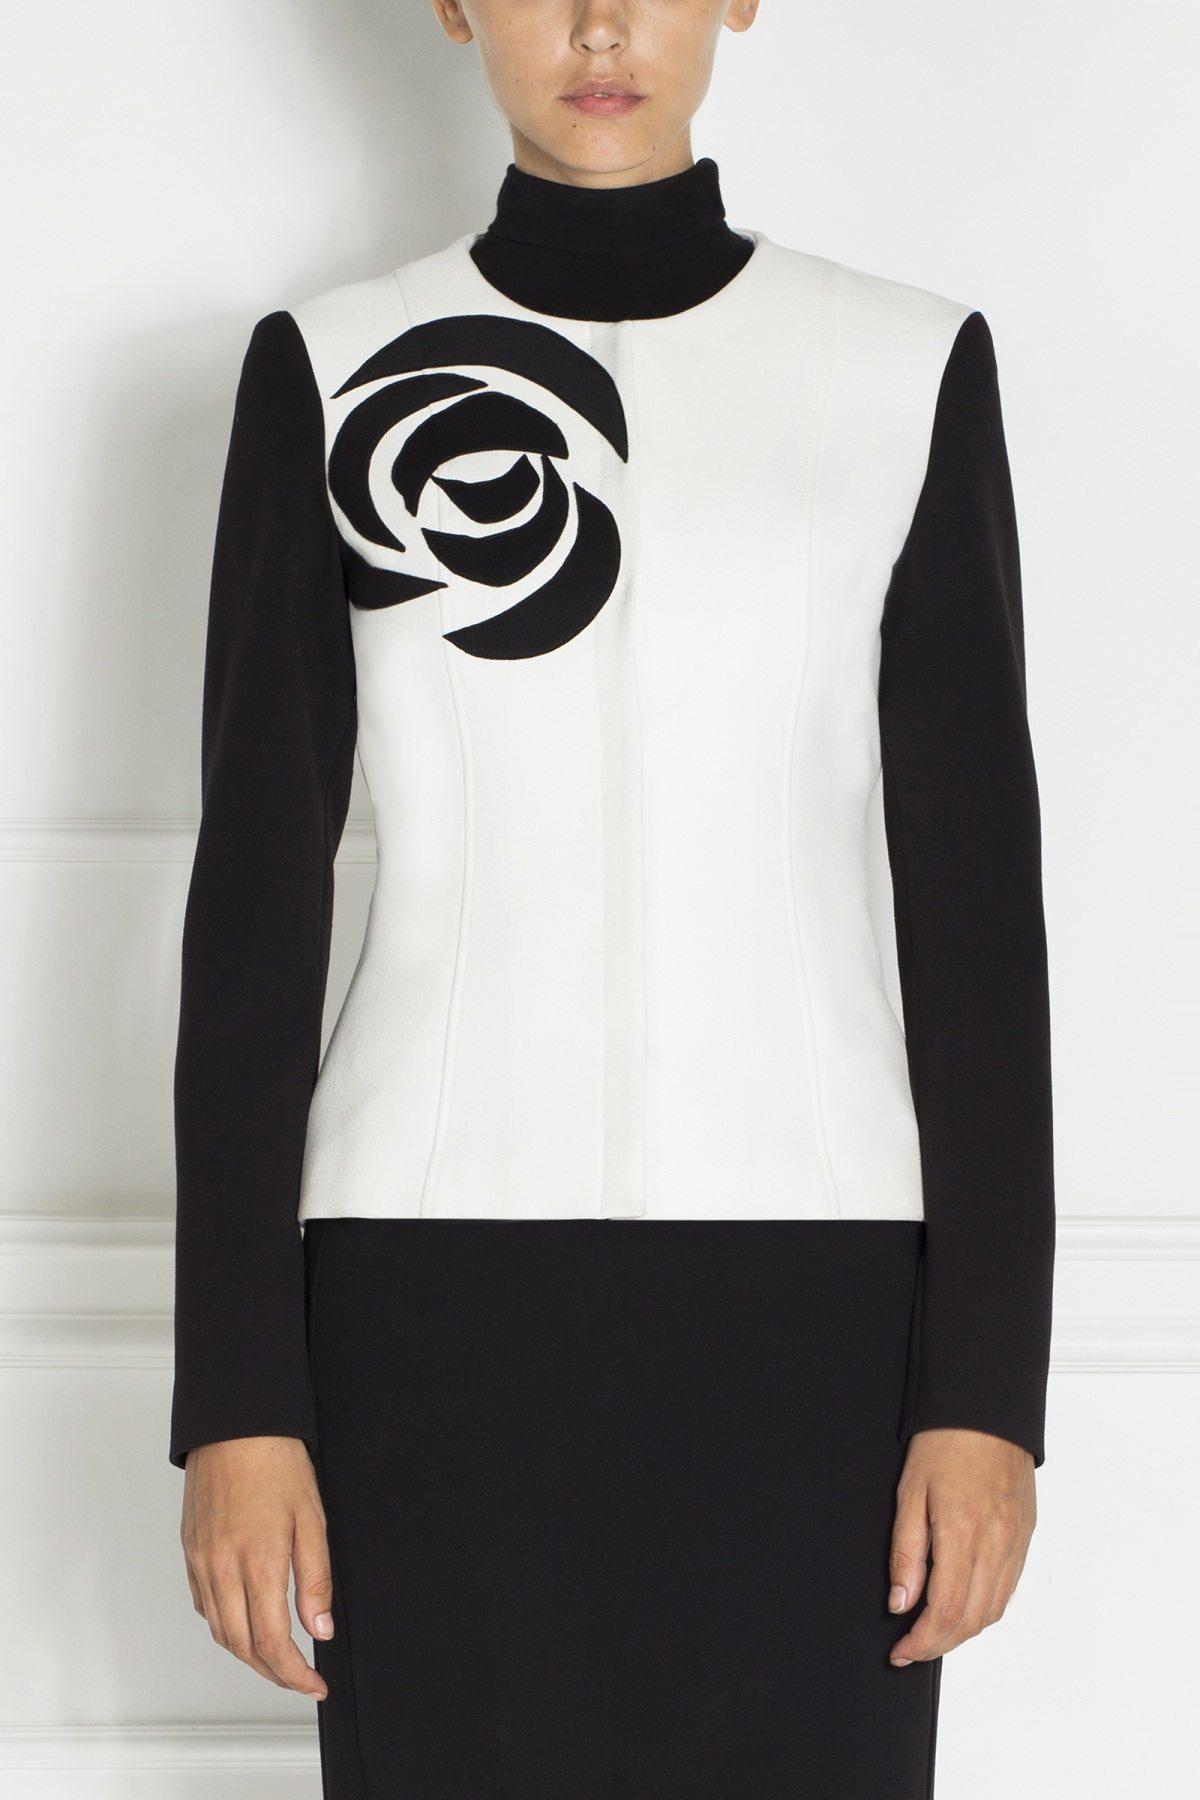 Jacheta eleganta in culori contrastante Negru/Alb